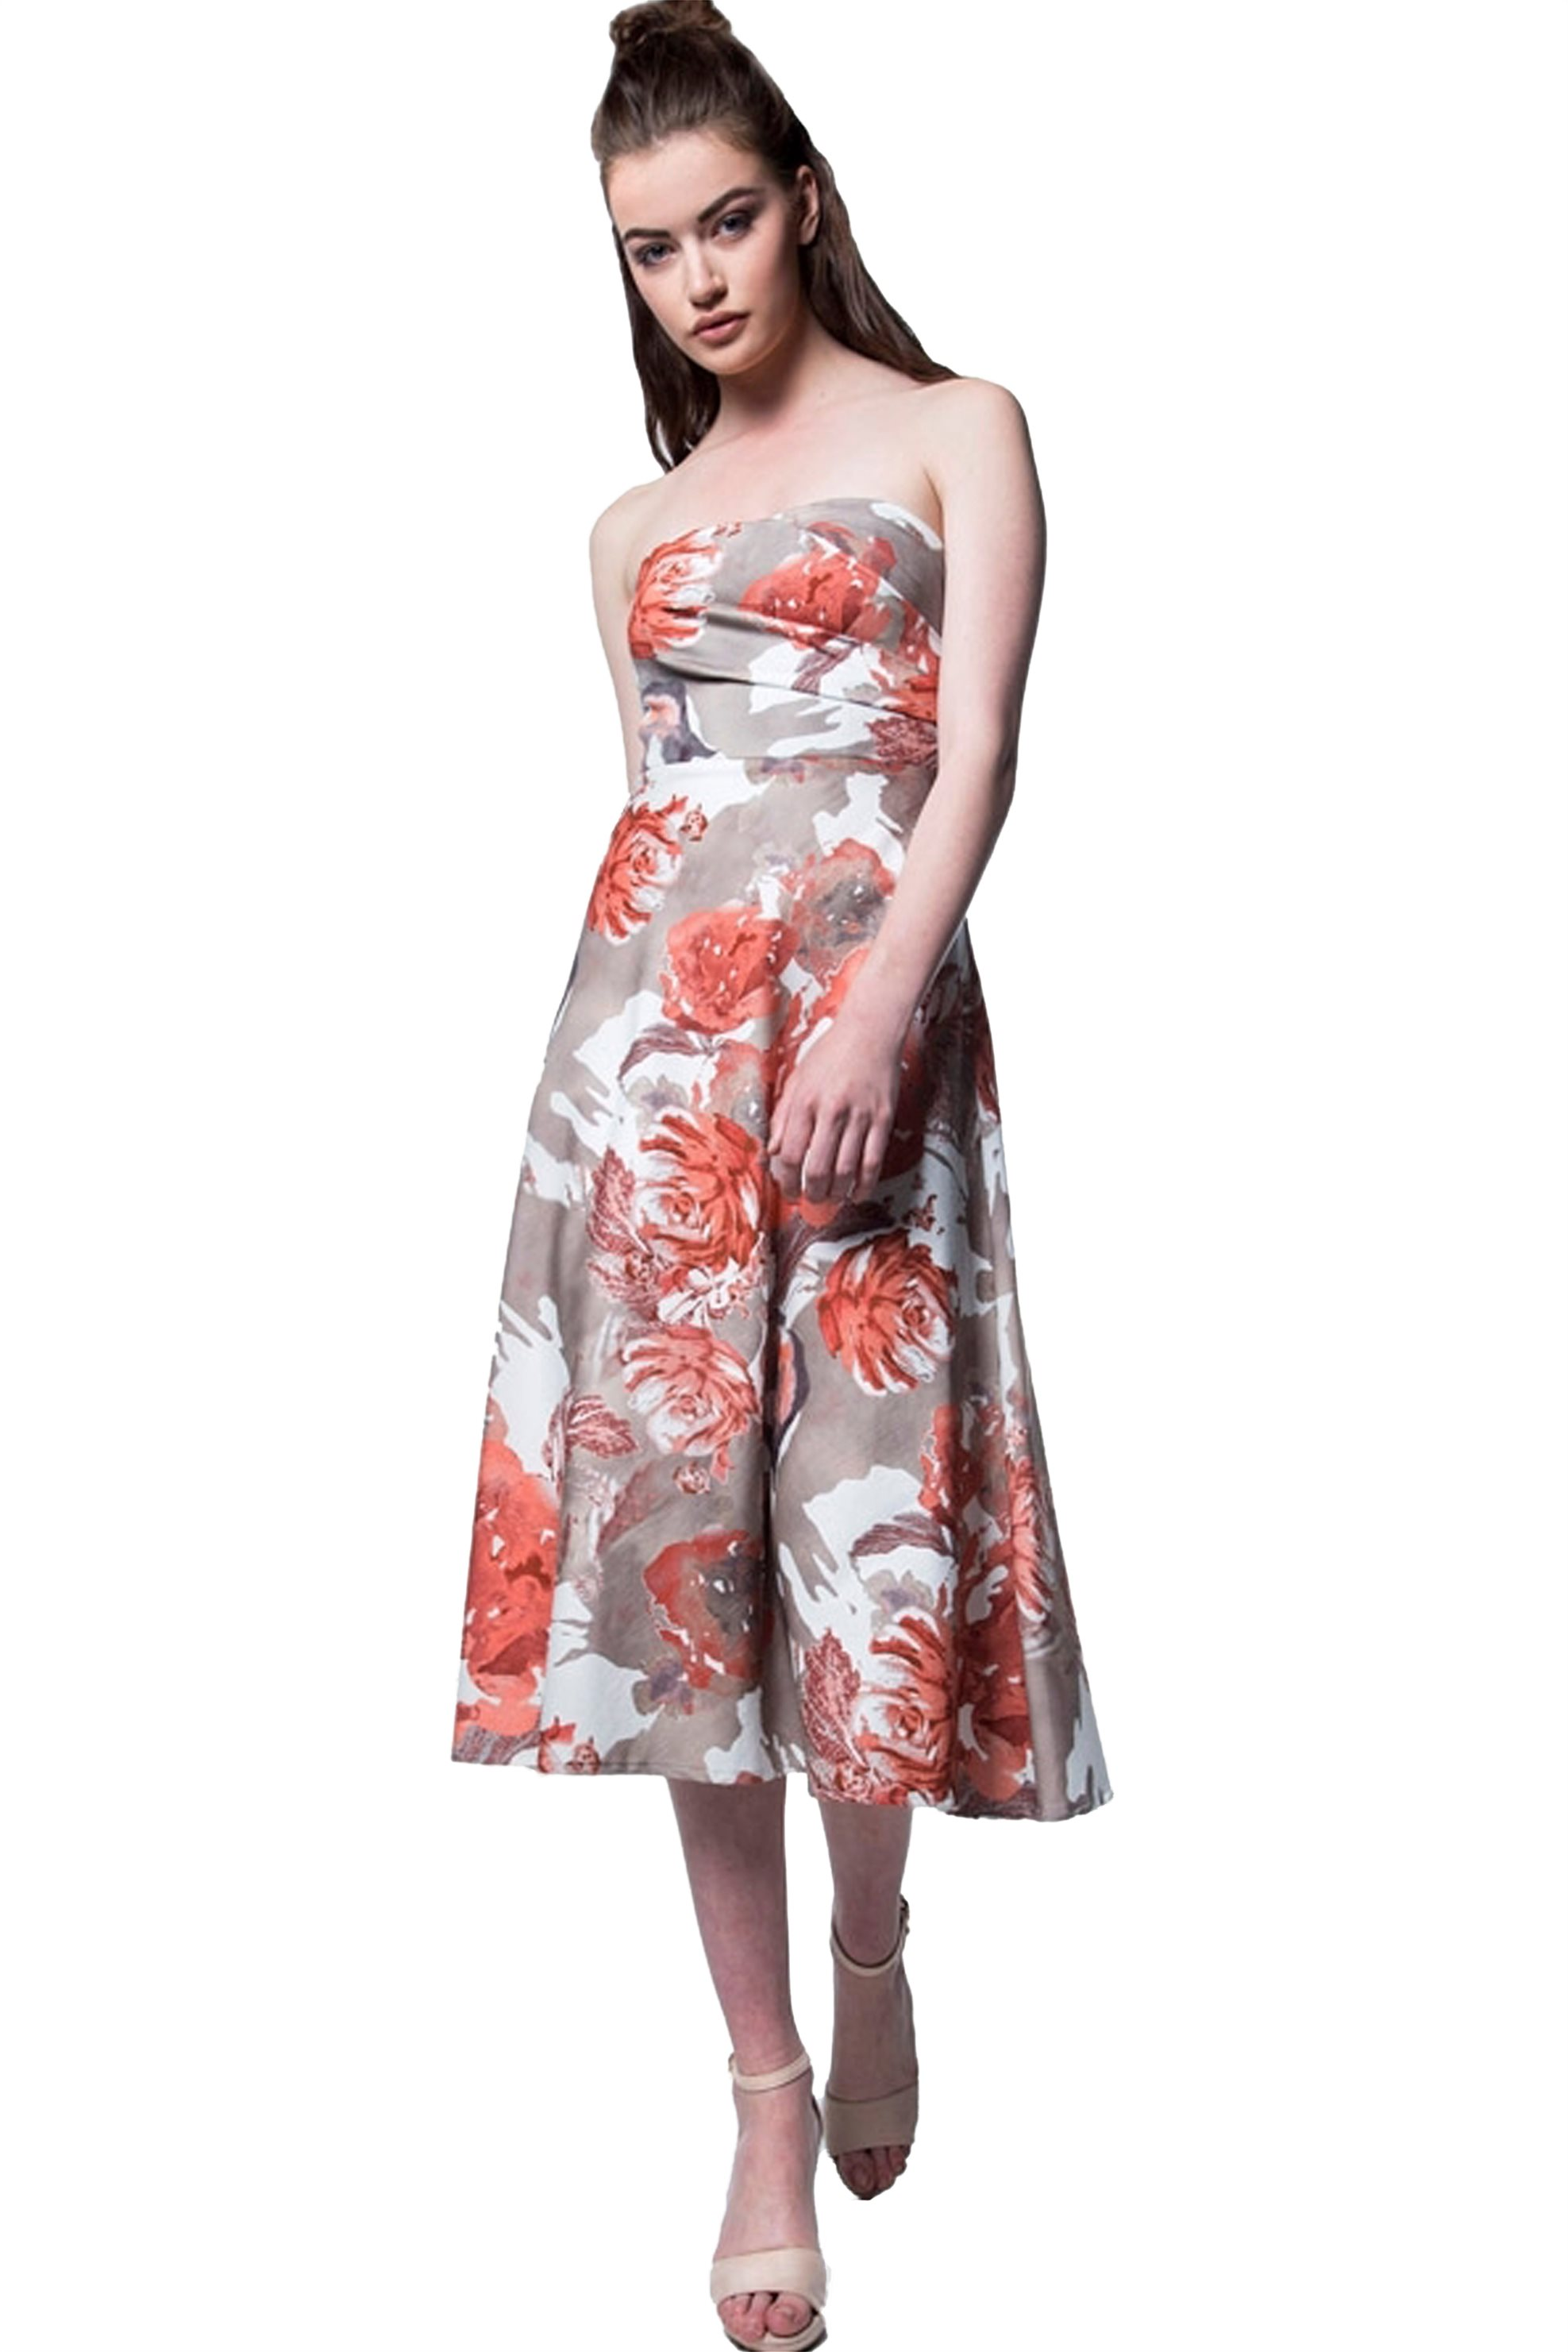 fdb39fd5d0a1 Γυναικεία   Ρούχα   Φορέματα   Καθημερινά   9044 GB Εντυπωσιακό μάξι ...